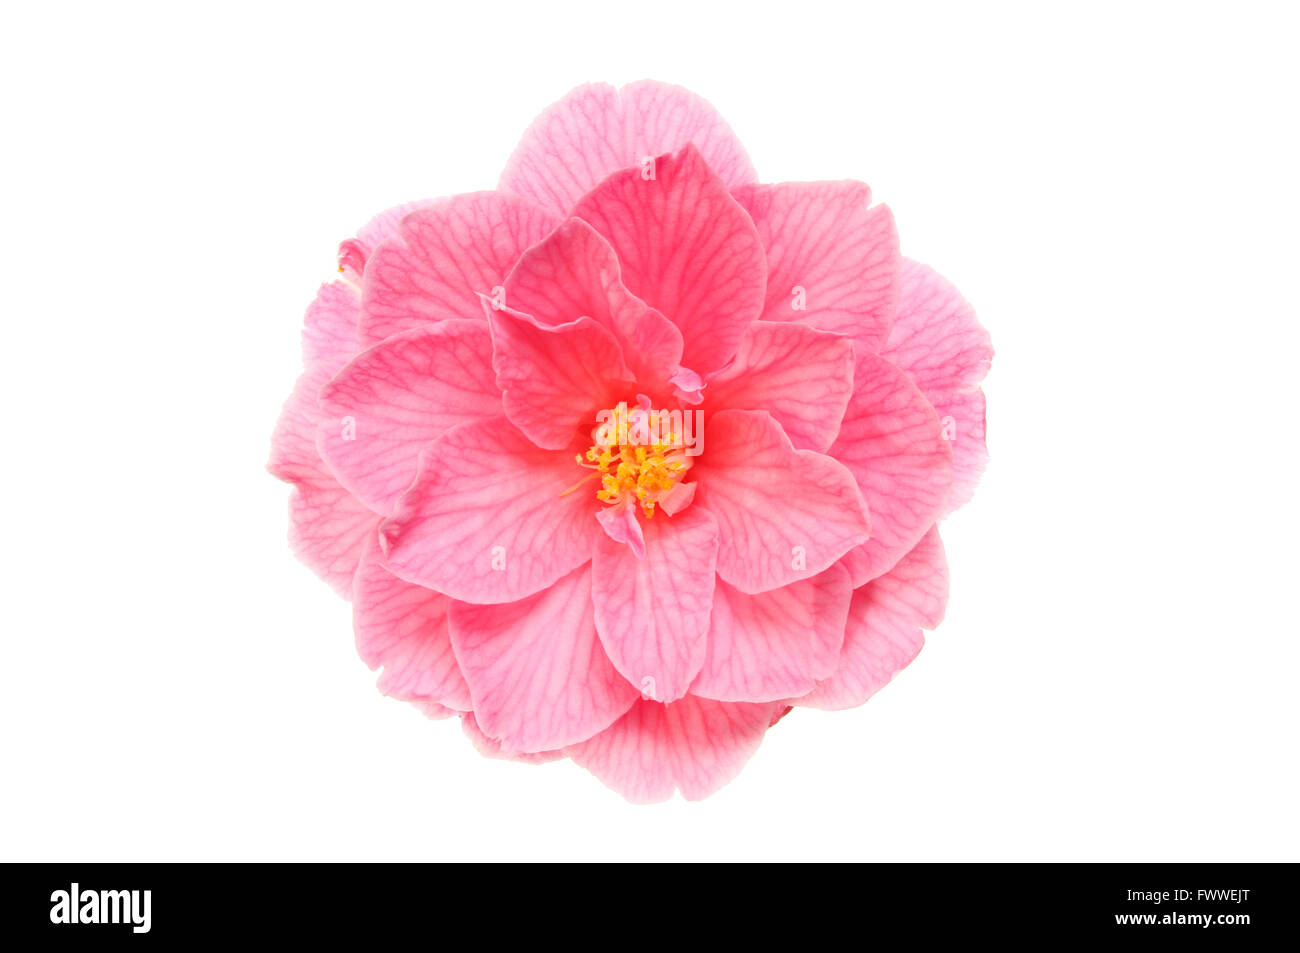 Magenta Camellia flower isolated against white - Stock Image